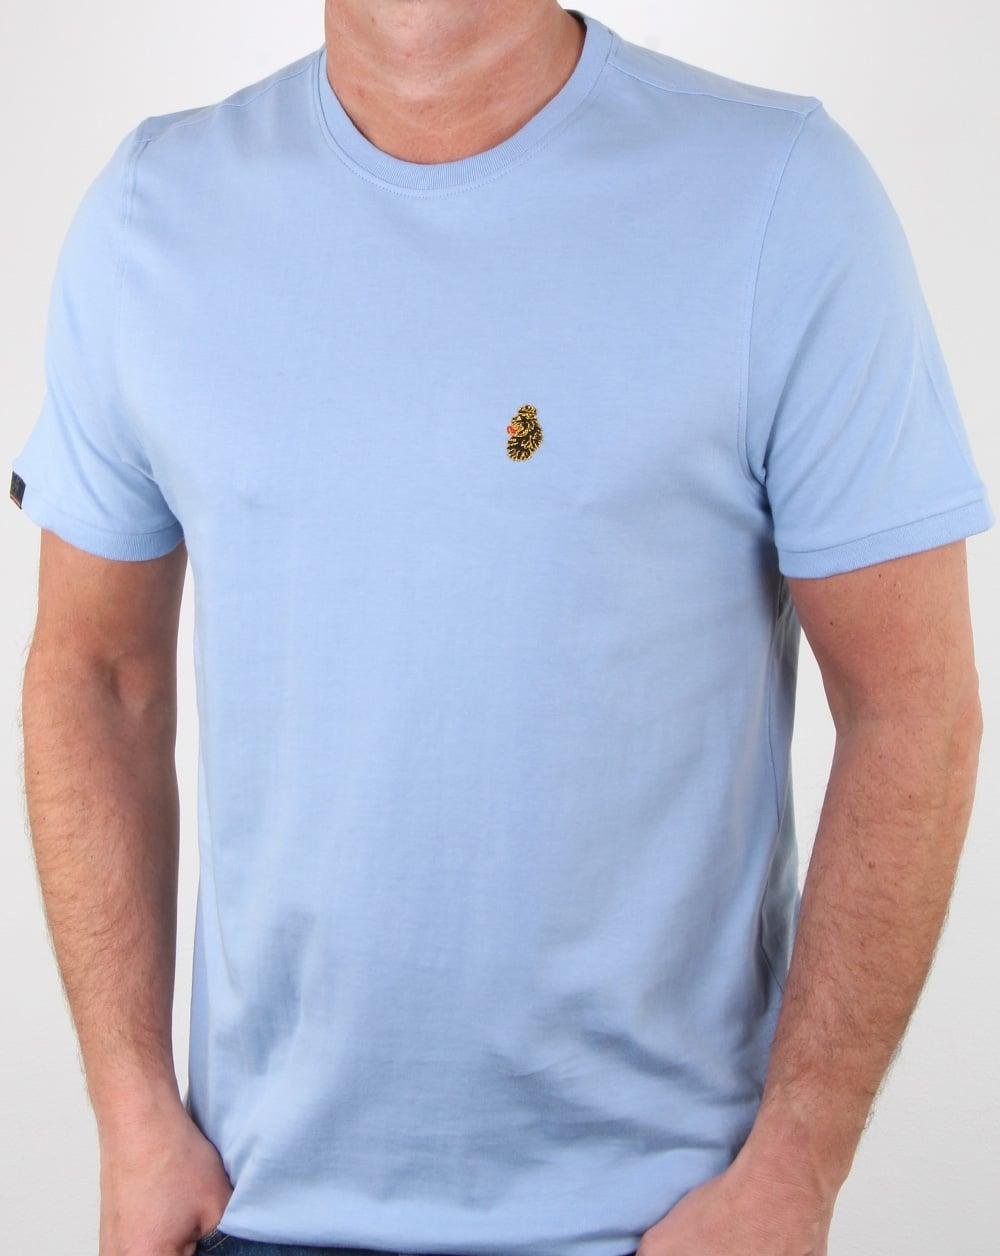 c10f819a Luke Traff T Shirt Sky Blue, Mens, Tee, Crew Neck, Cotton